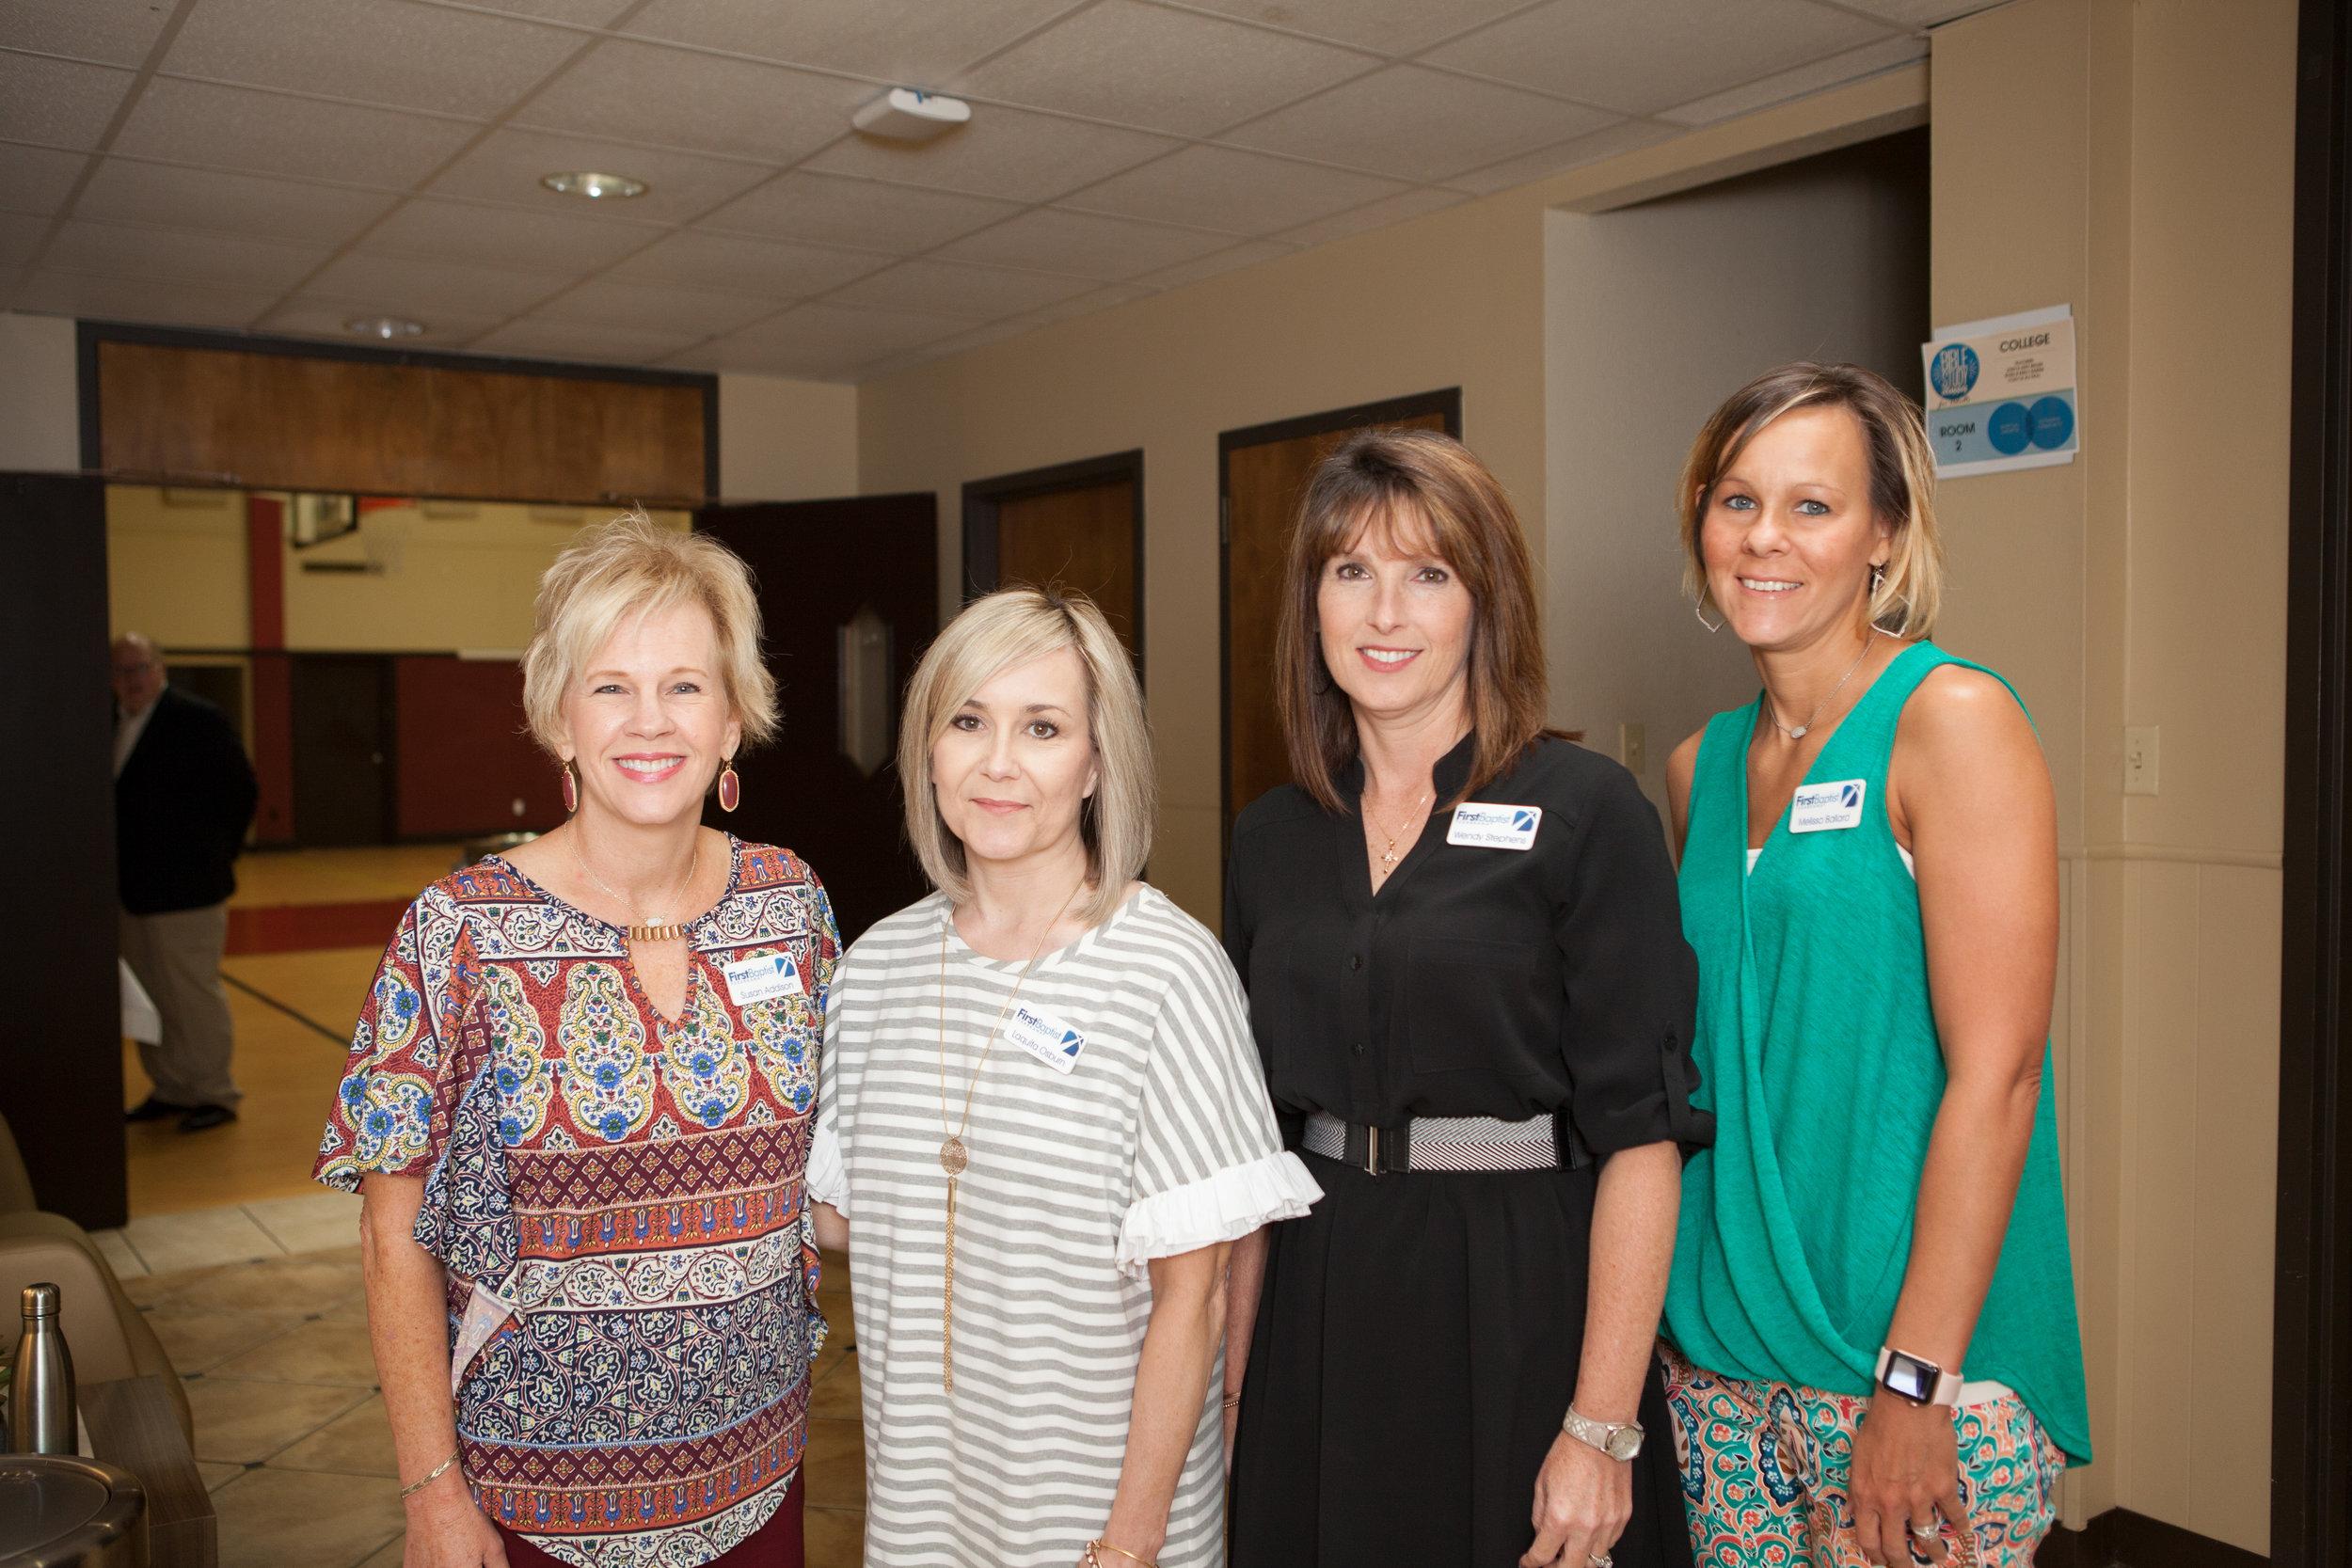 Susan Addison, Laquita Osburn, Wendy Stephens and Melissa Ballard